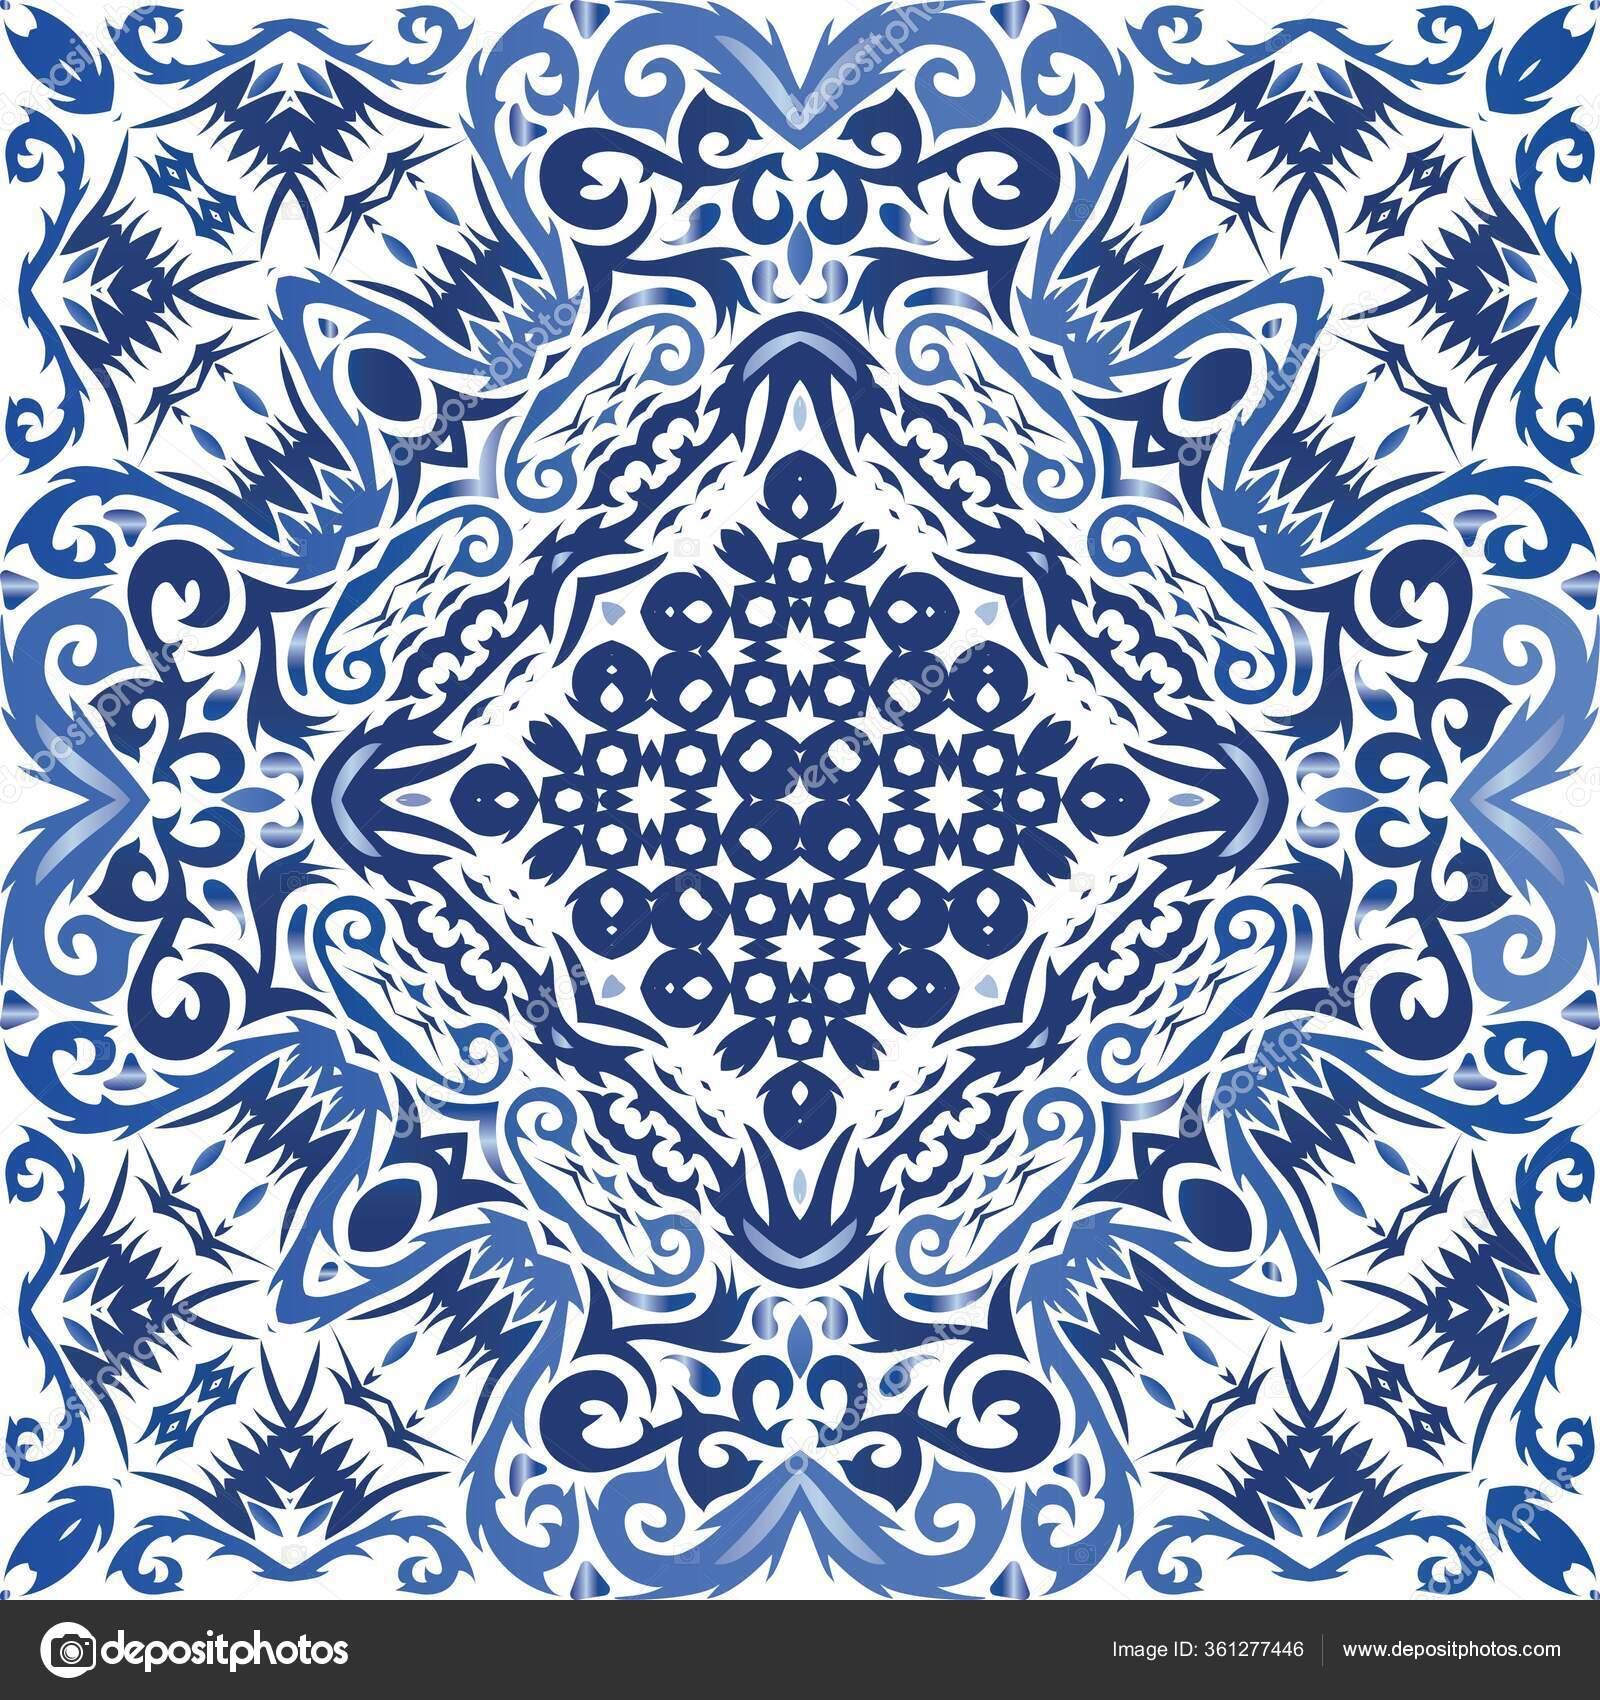 Ceramic Tiles Azulejo Portugal Kitchen Design Vector Seamless Pattern Template Stock Vector C Eduha71 Gmail Com 361277446